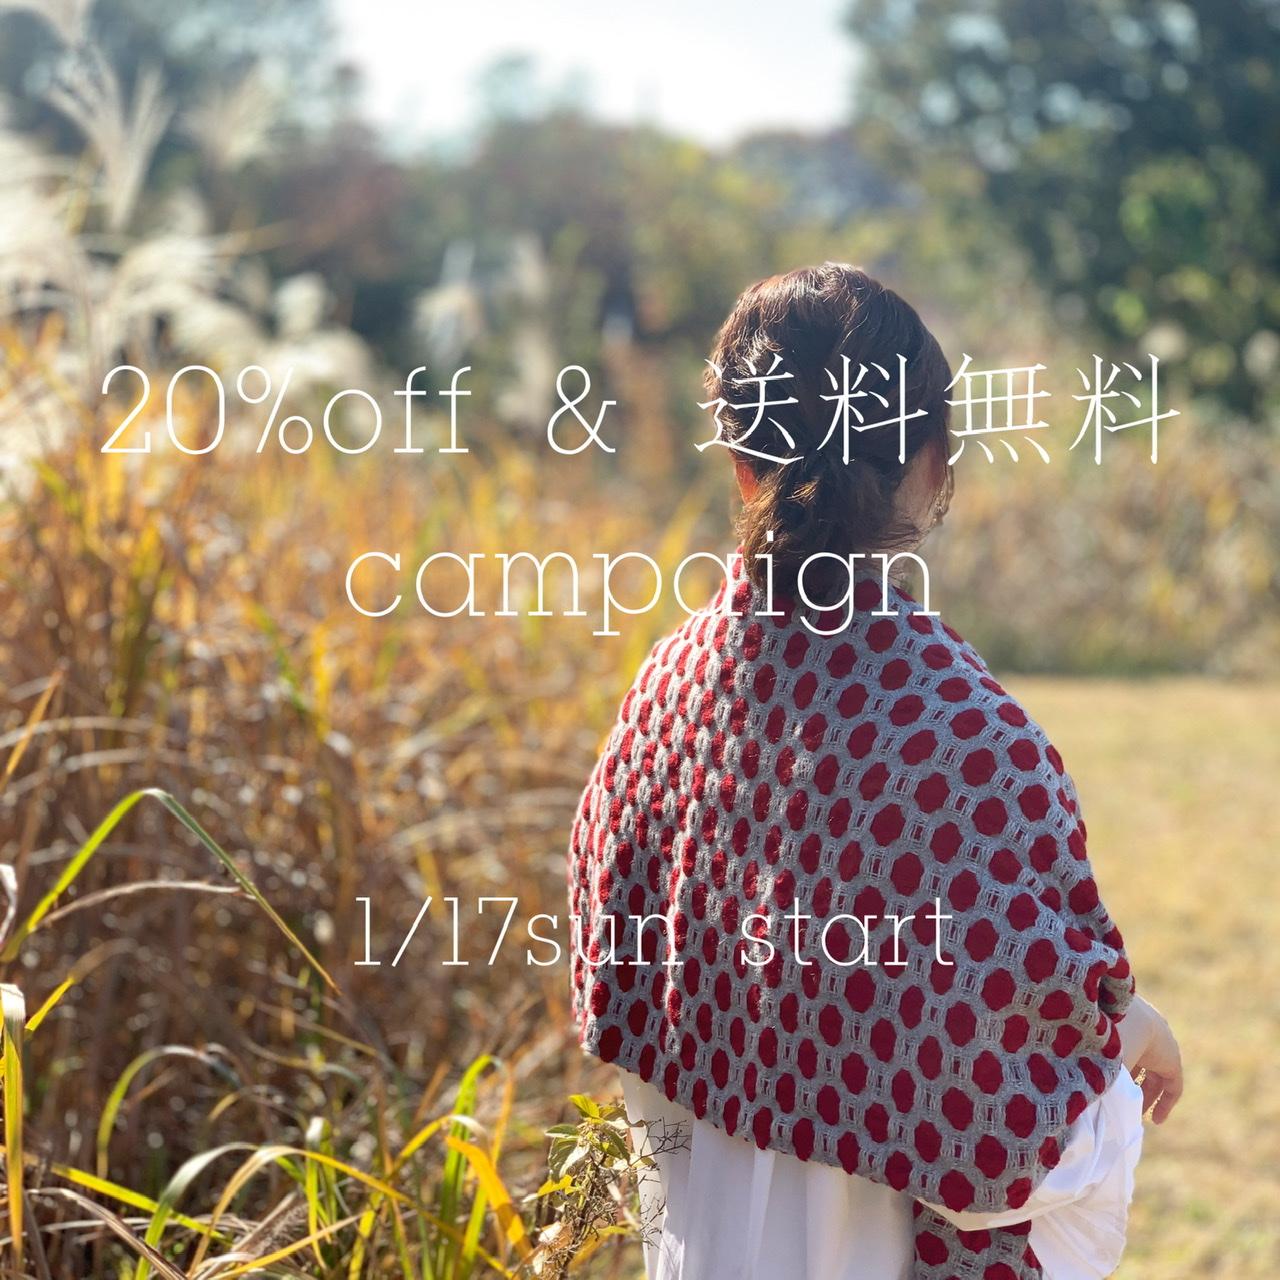 20%off &送料無料 campaign 1/17sun start!